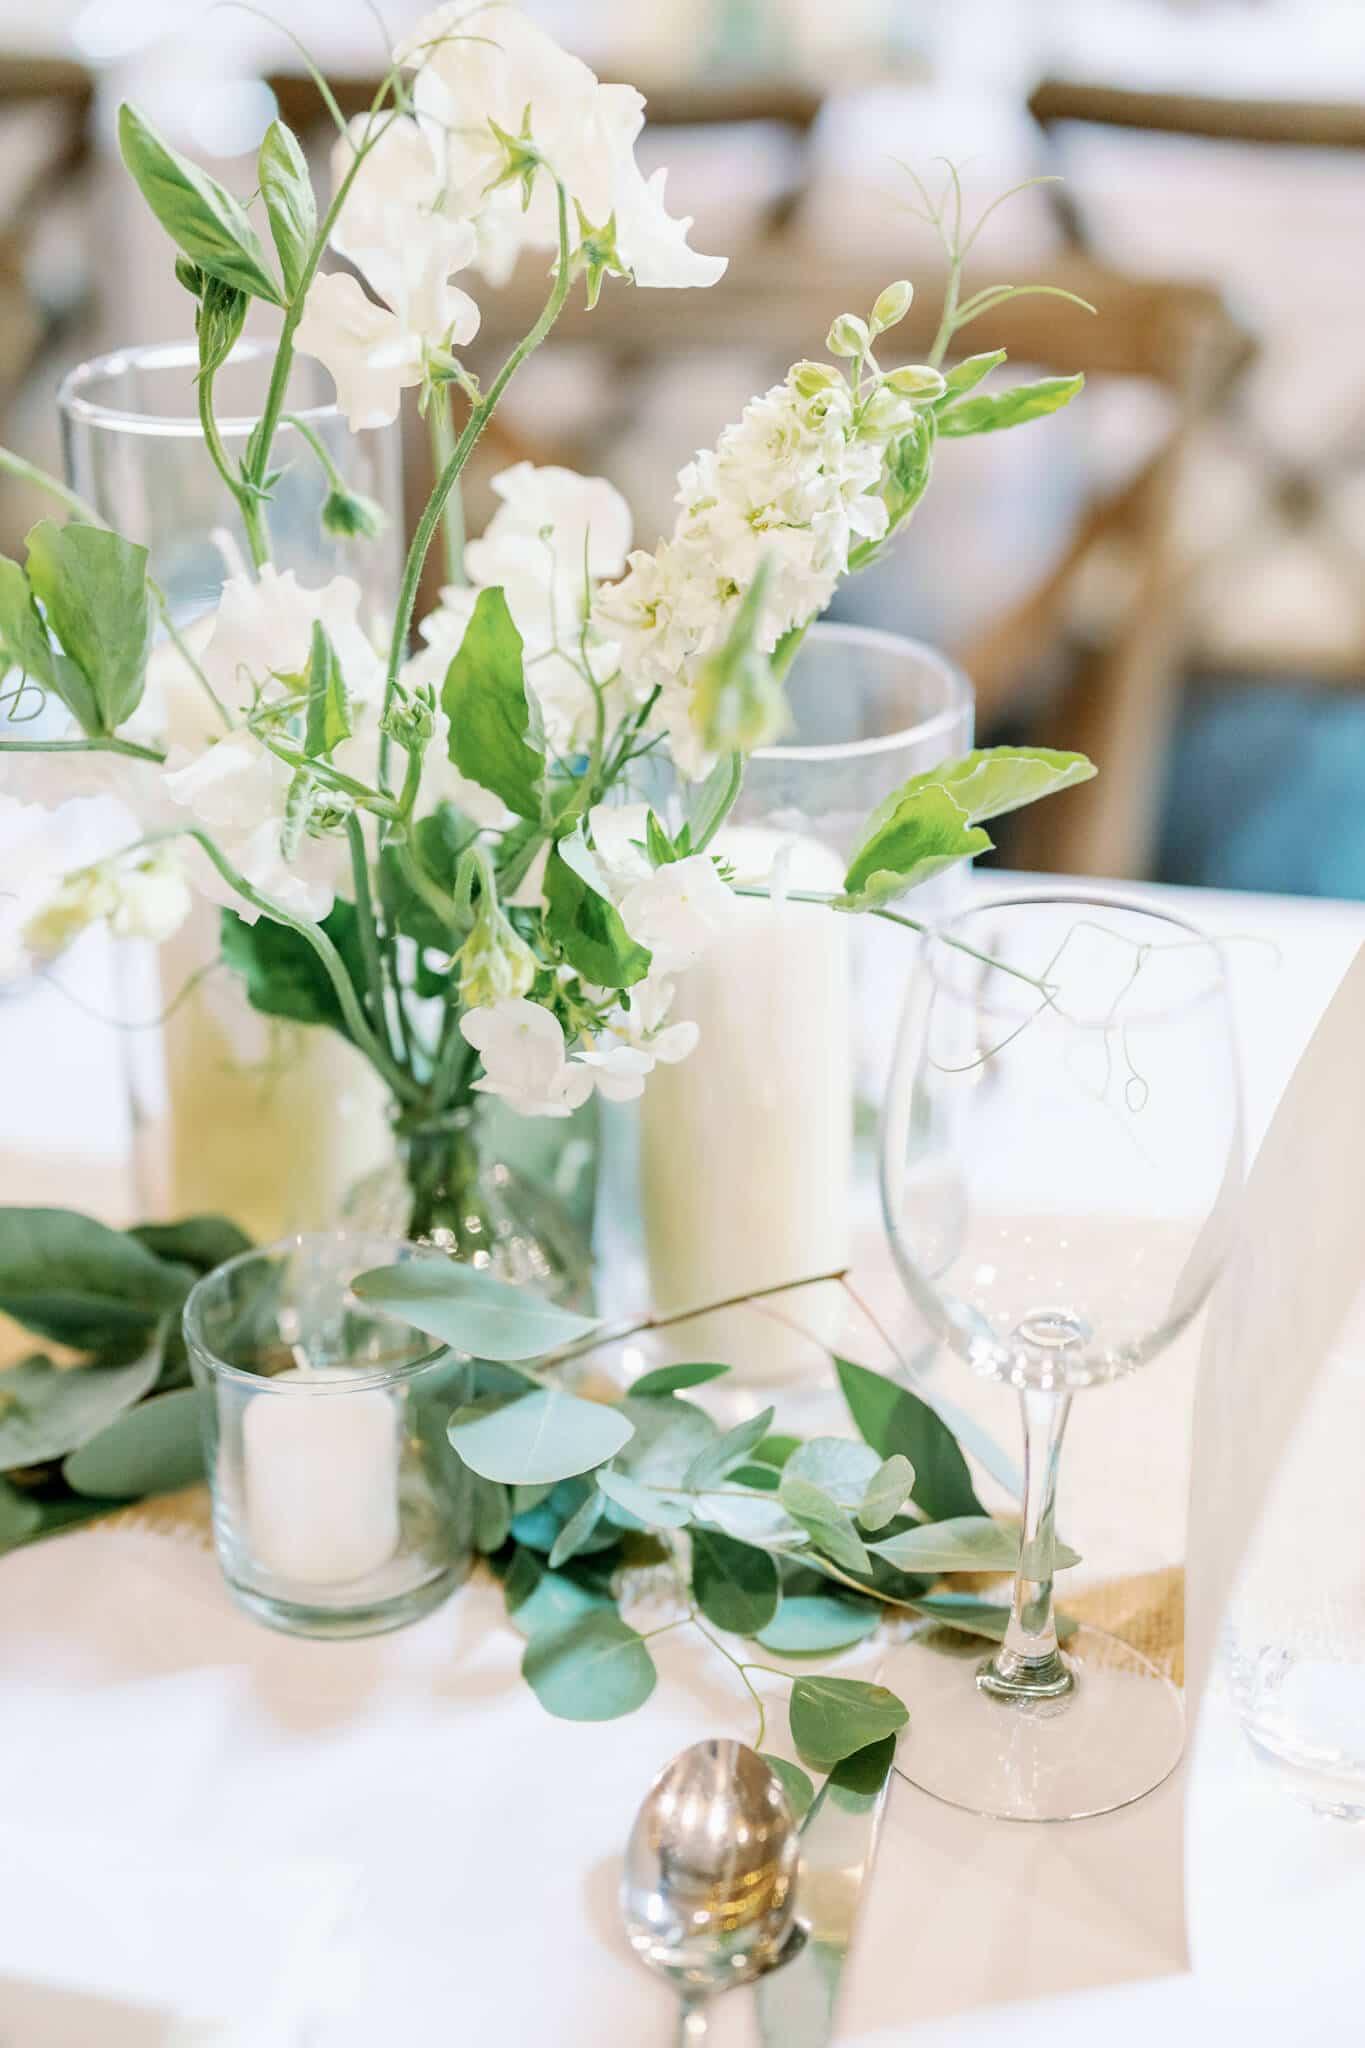 Lains Barns wedding decor centrepiece